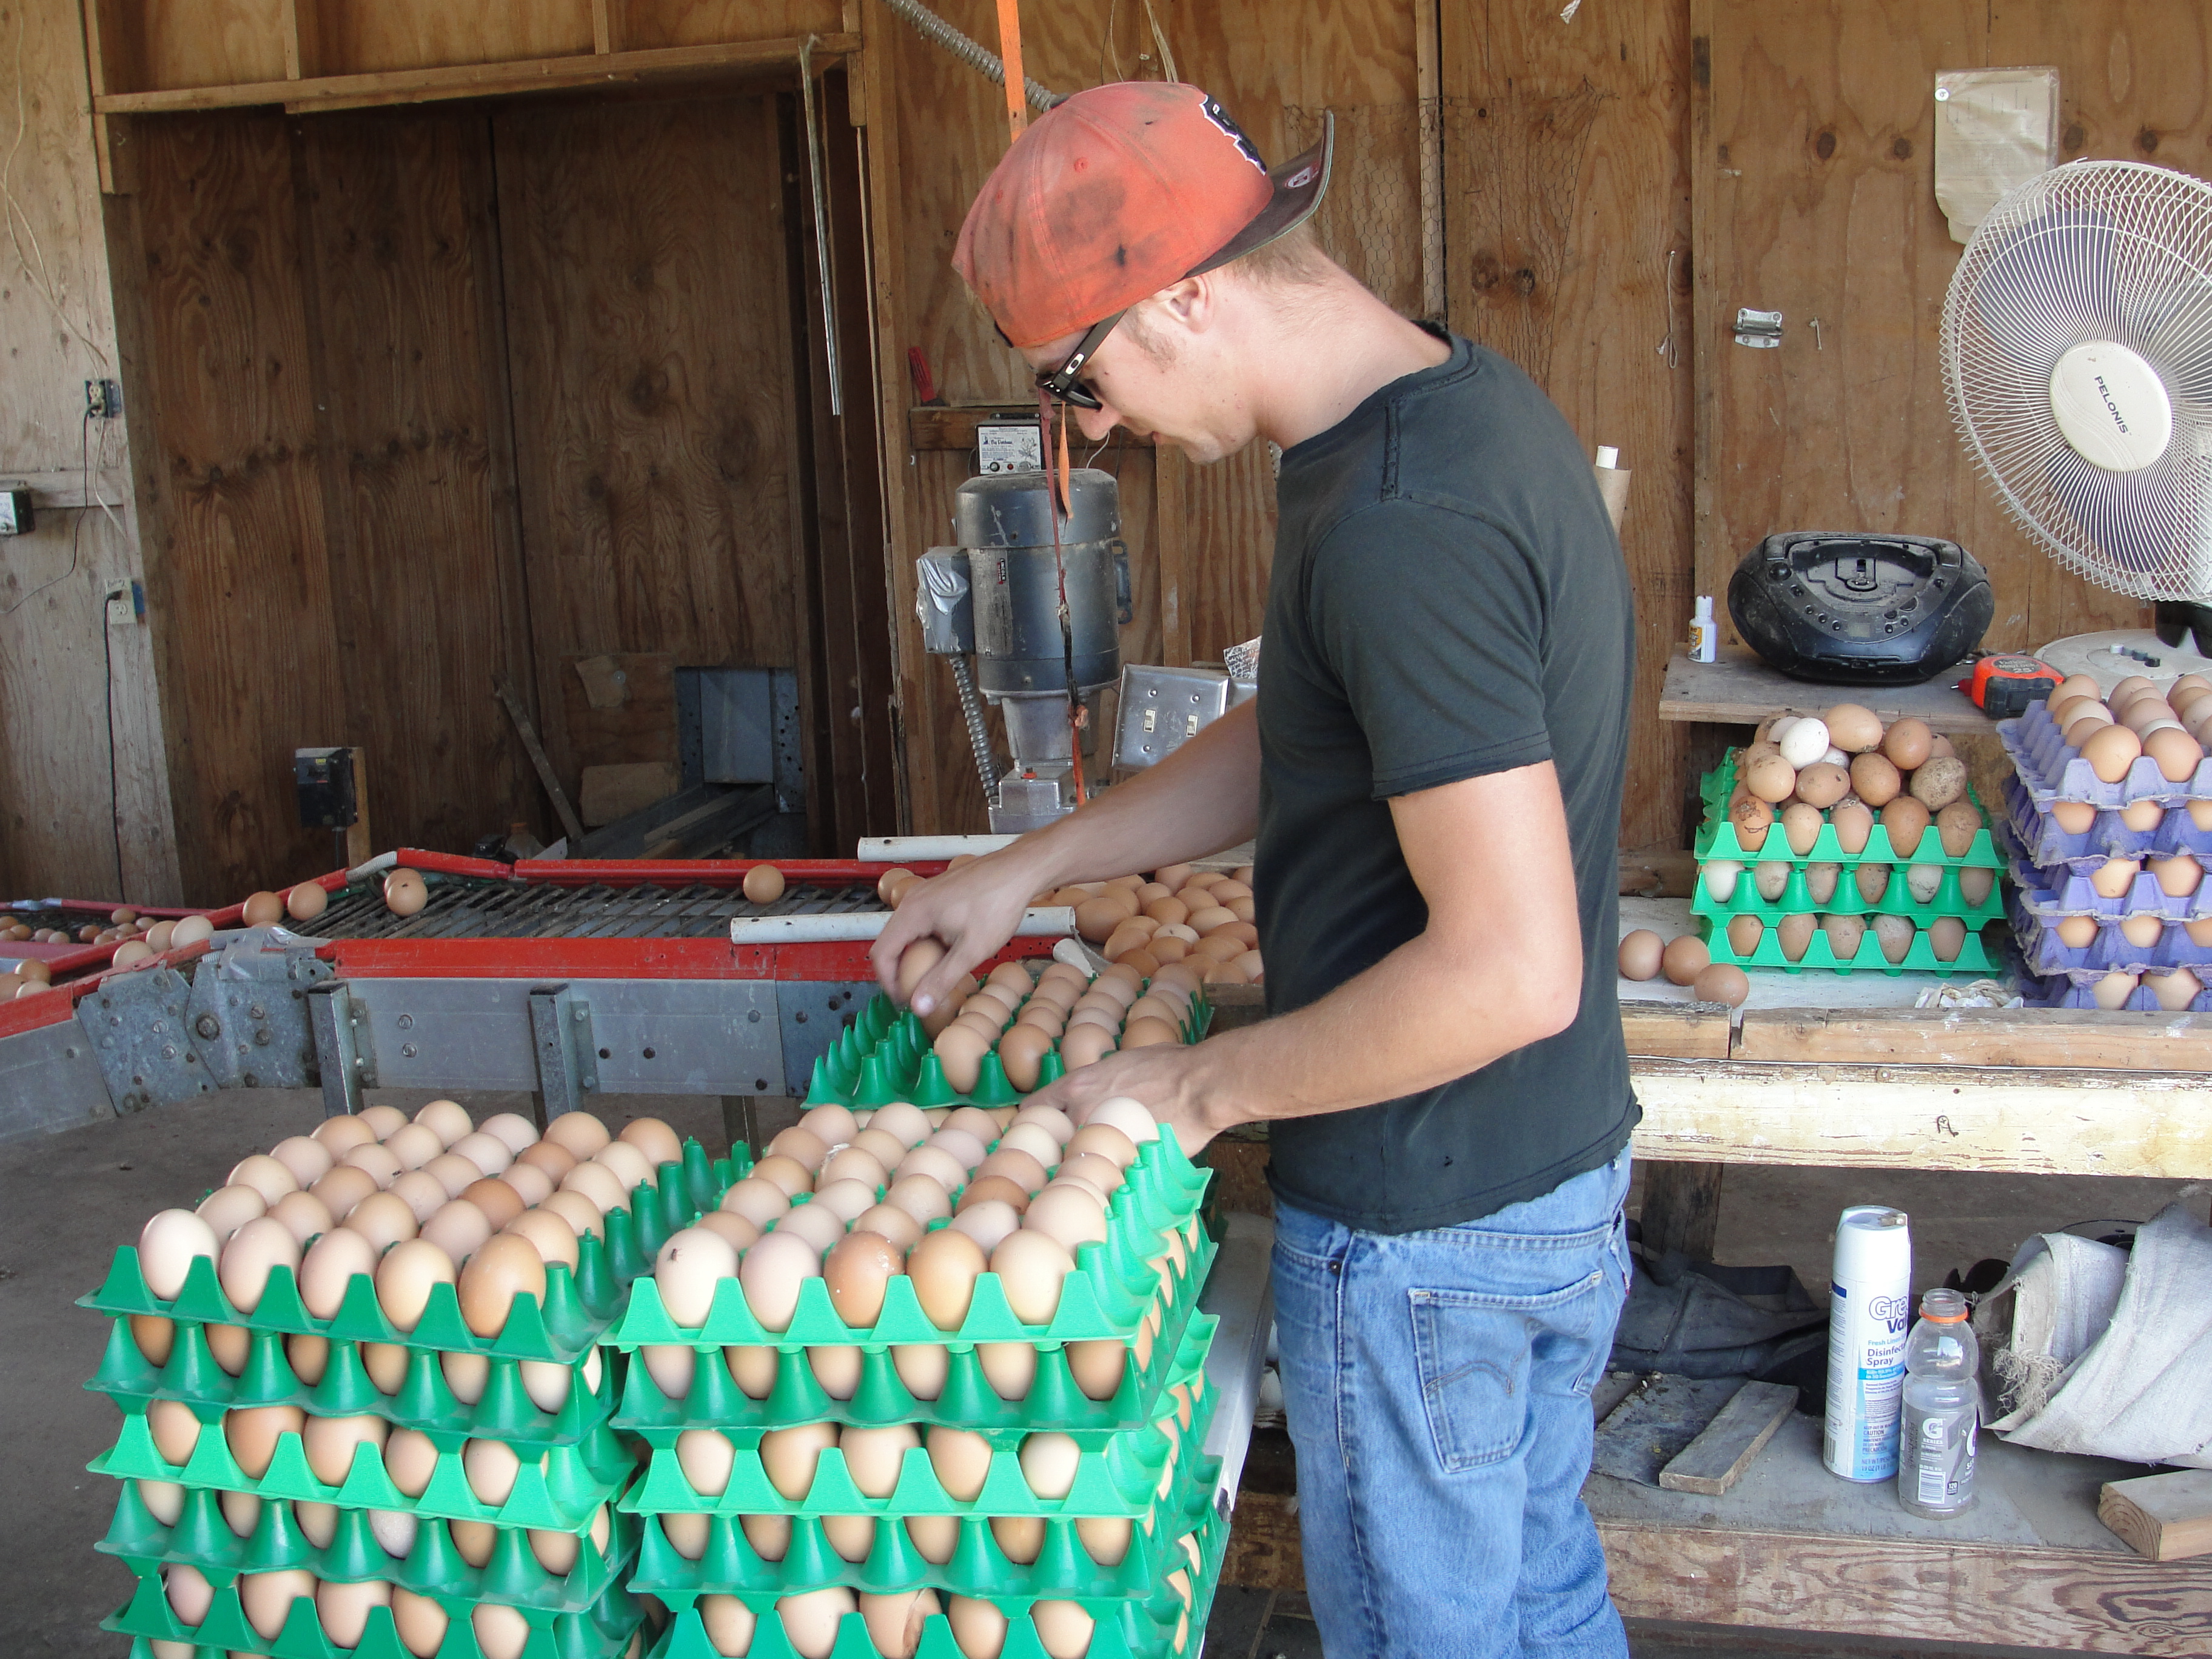 Man Organizing Eggs